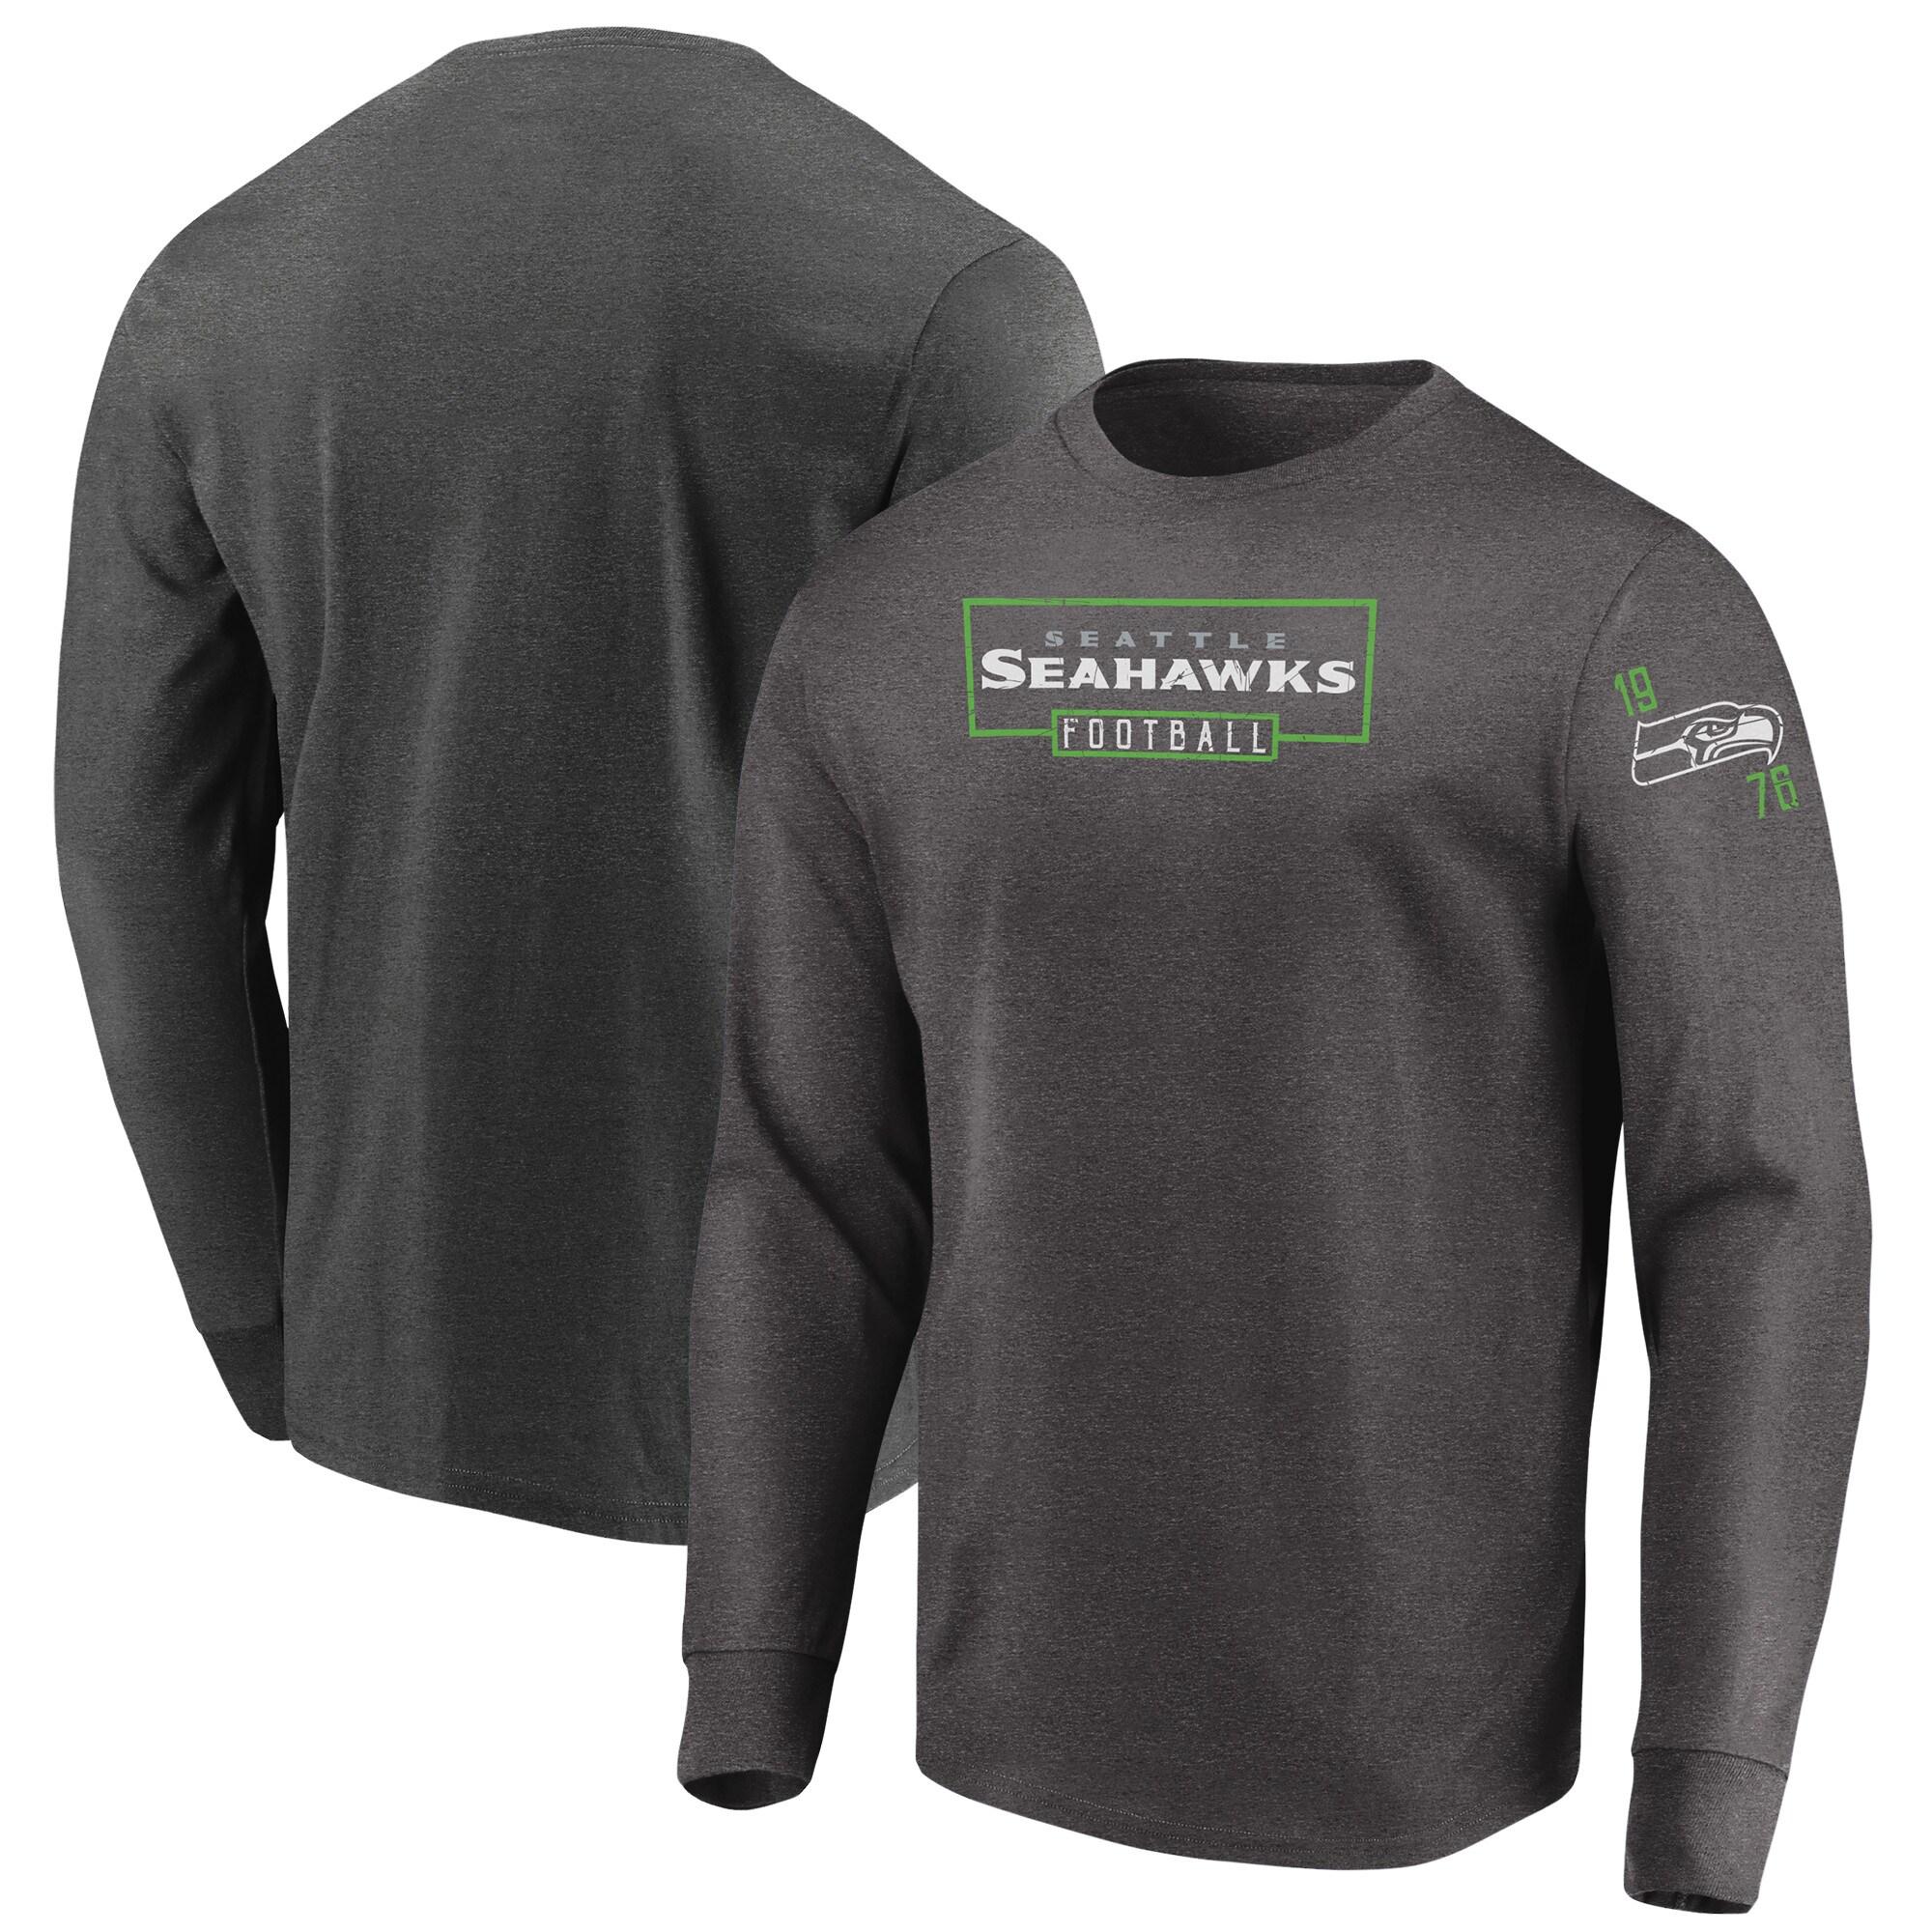 Seattle Seahawks Majestic Big & Tall Kick Return Long Sleeve T-Shirt - Heathered Charcoal